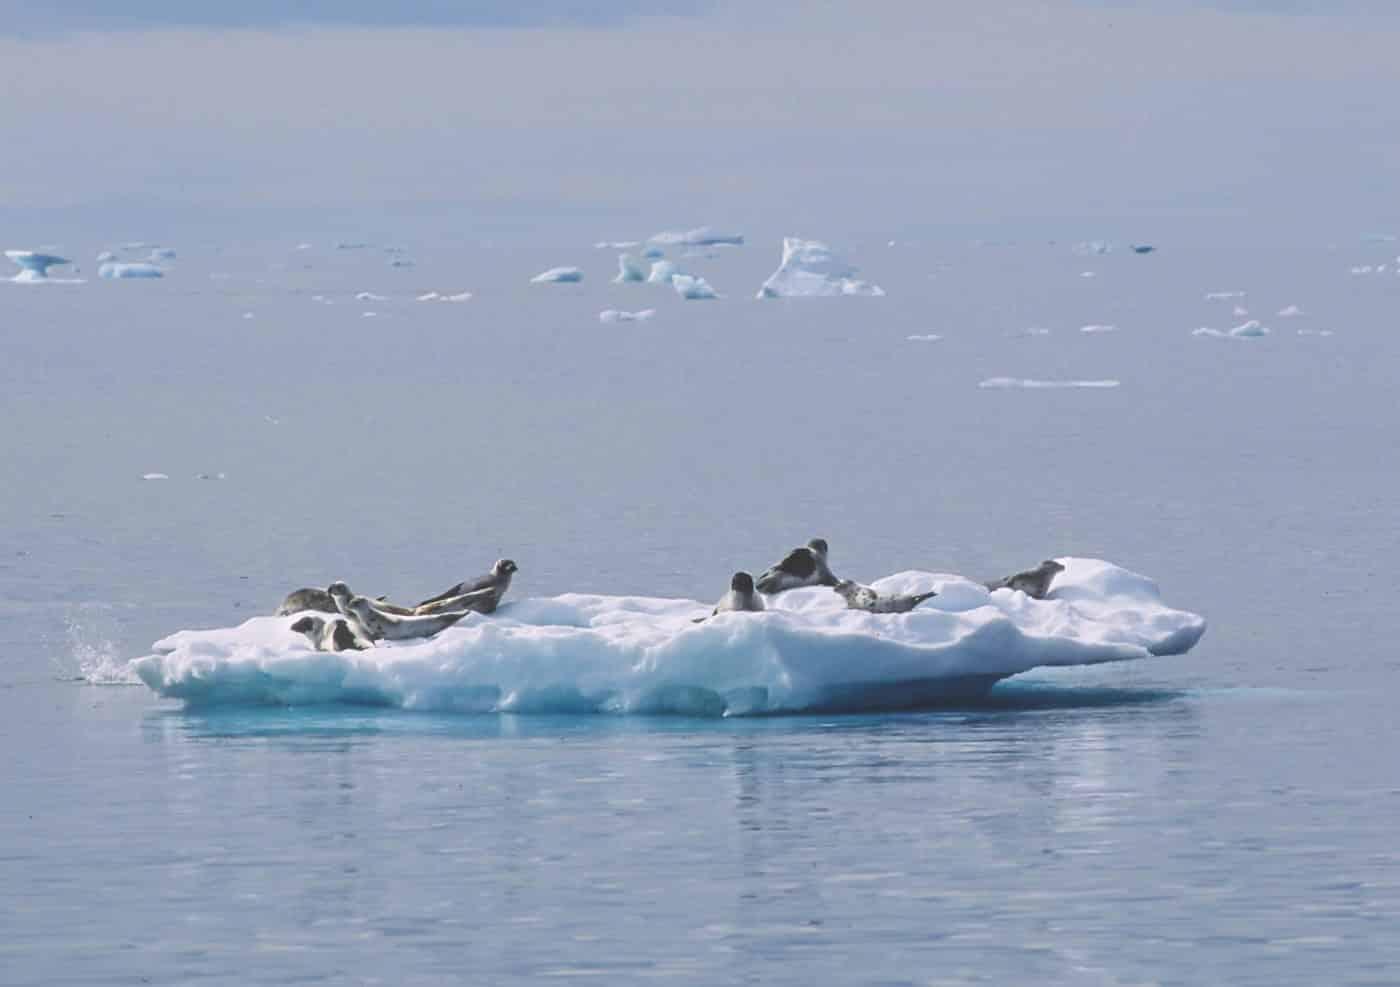 Harp Seal (grænlandssæl), by Aqqa Rosing-Asvid